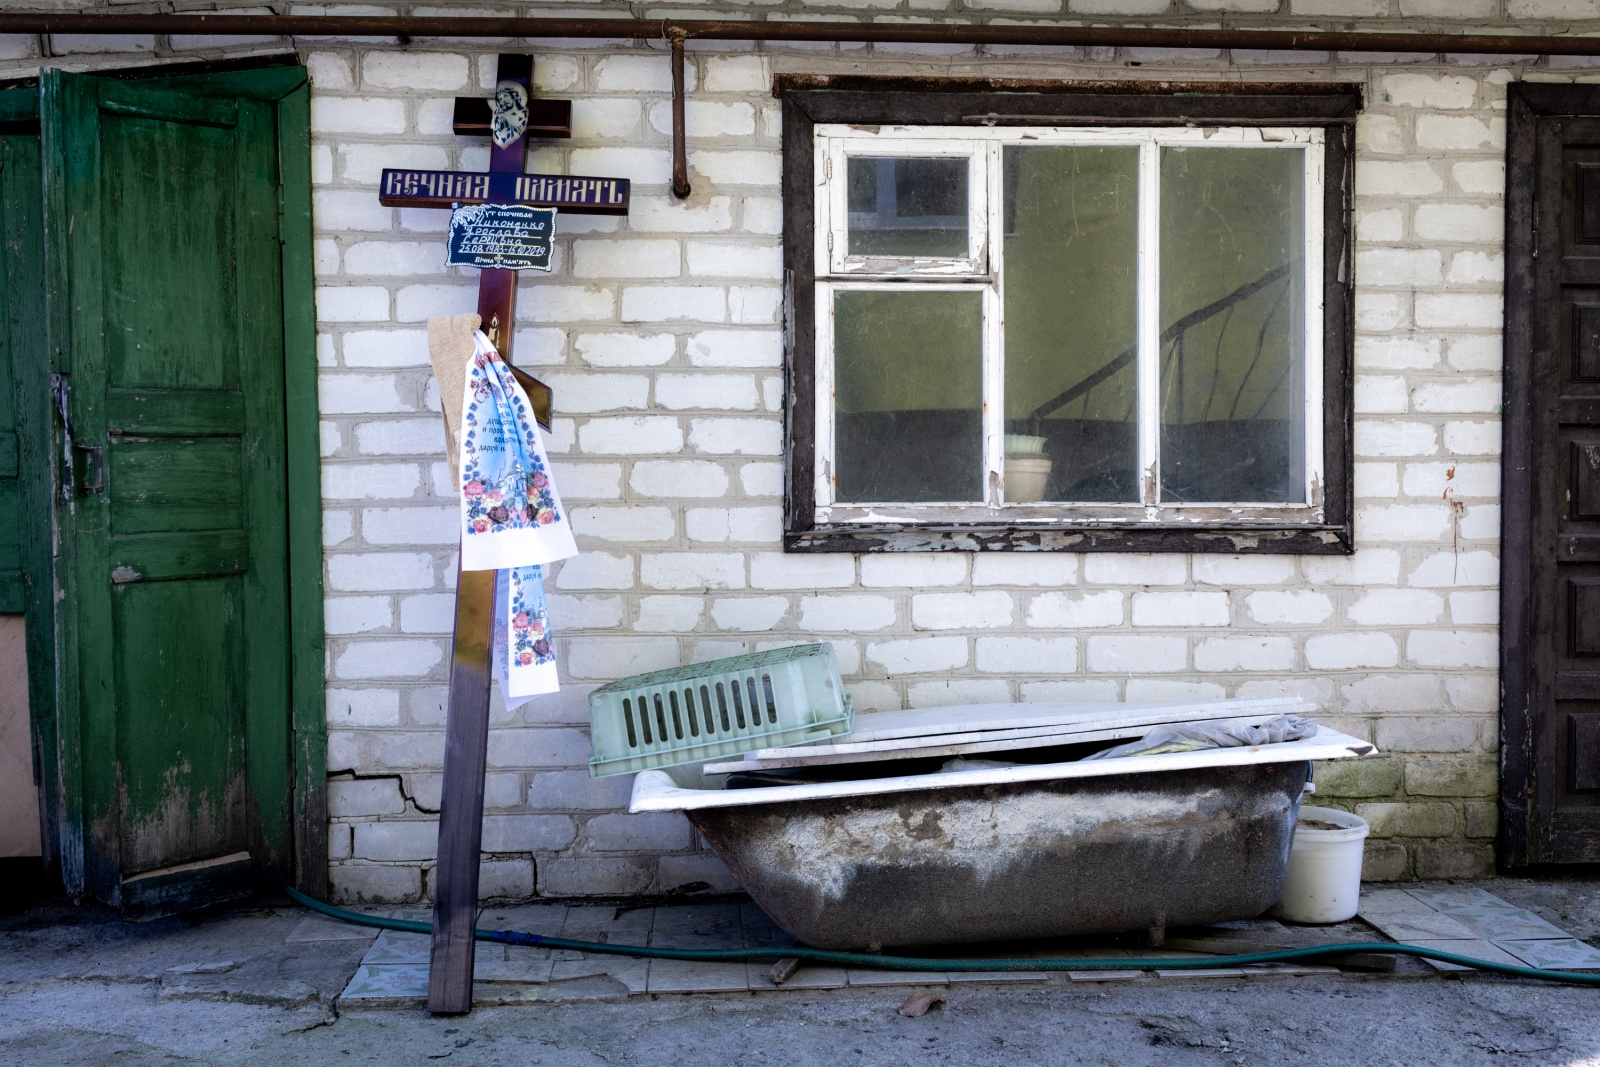 Myrhorod, Ukraine (2019). The funeral of Yaroslava Nykonenk, killed by a prorussian sniper in the Donbass